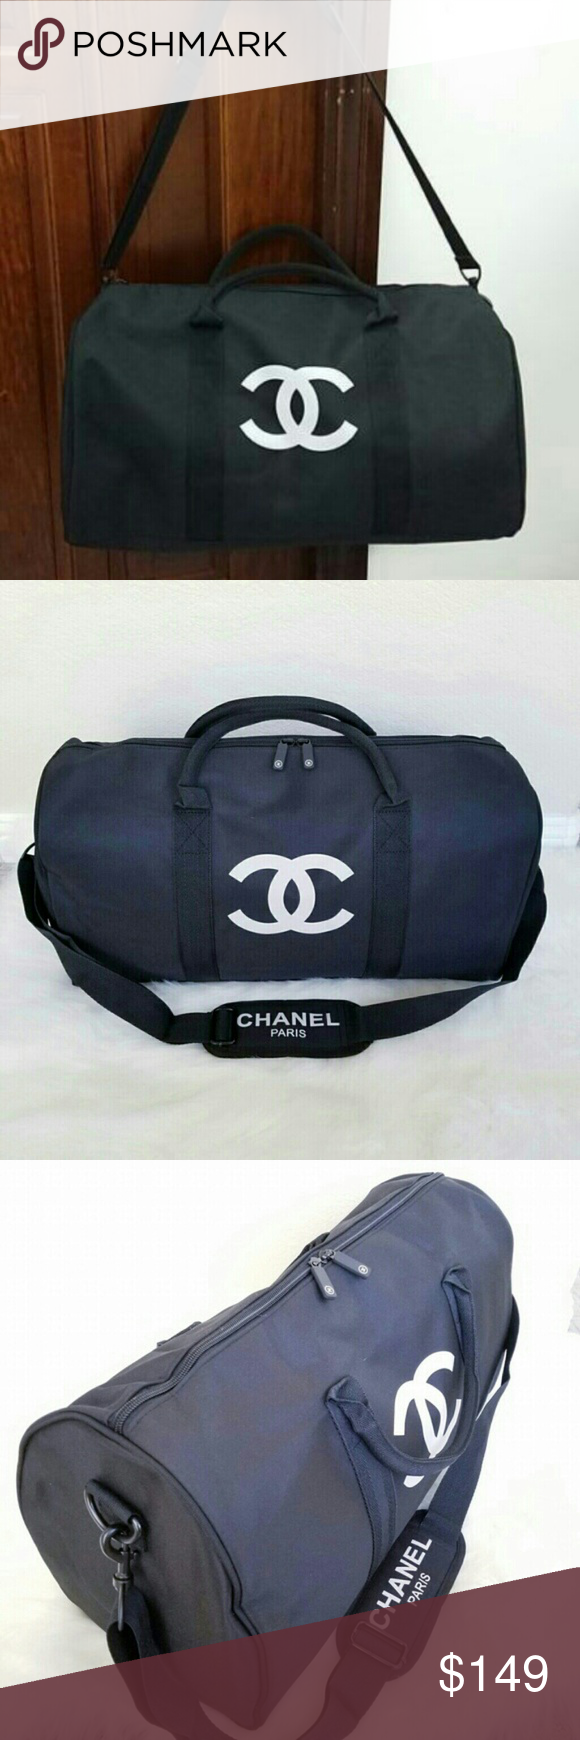 aa4240e93e7c Chanel travel bag gym bag vip gift bag Authentic Chanel vip gift bag travel bag  gym bag duffle bag. new with original packaging bag. Measure L 48cm x.